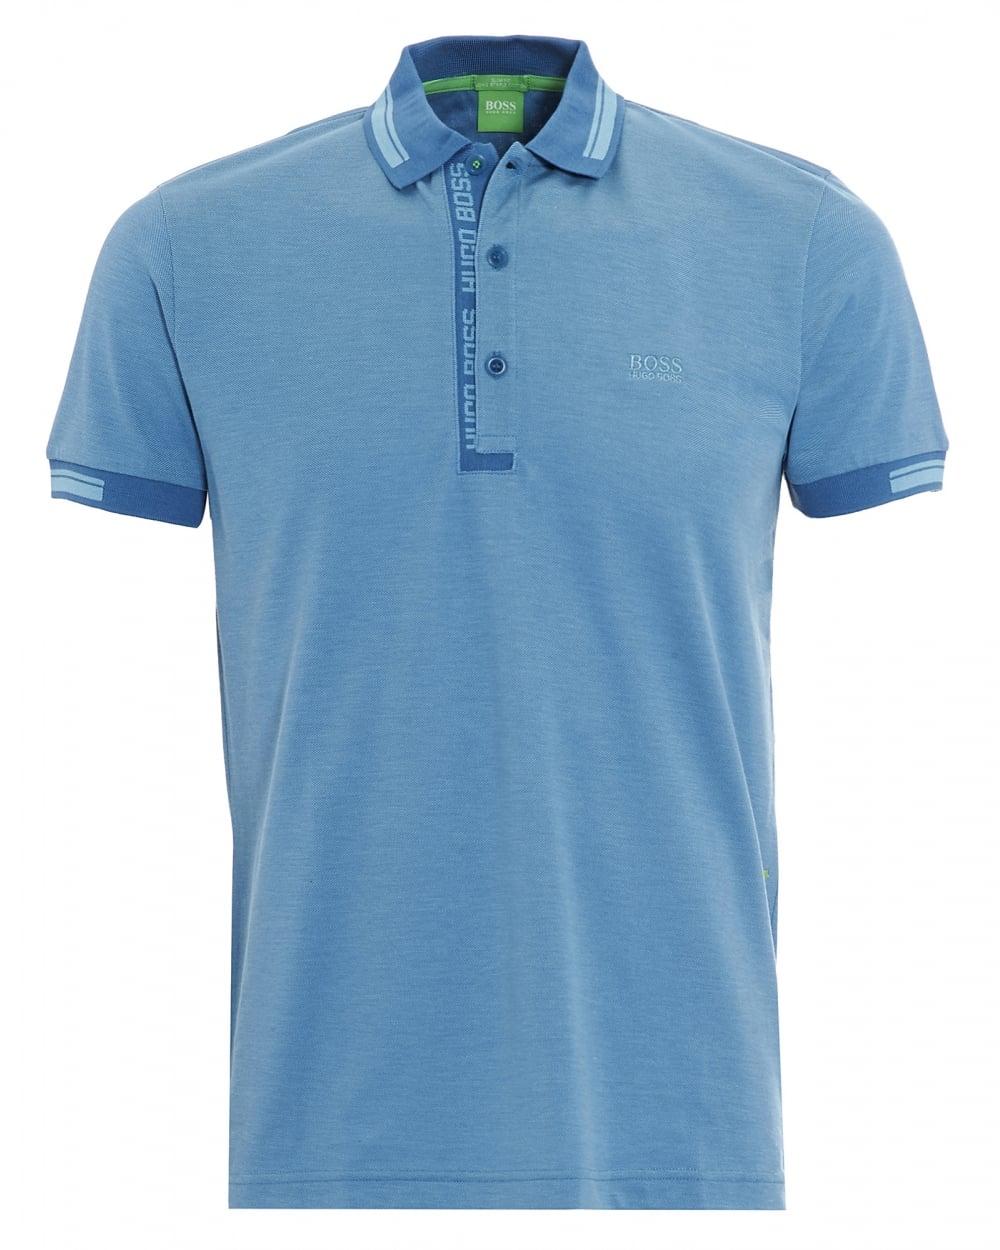 7d9cb3171 Hugo Boss Green Mens Paule 4 Polo Shirt, Blue Logo Tipped Polo